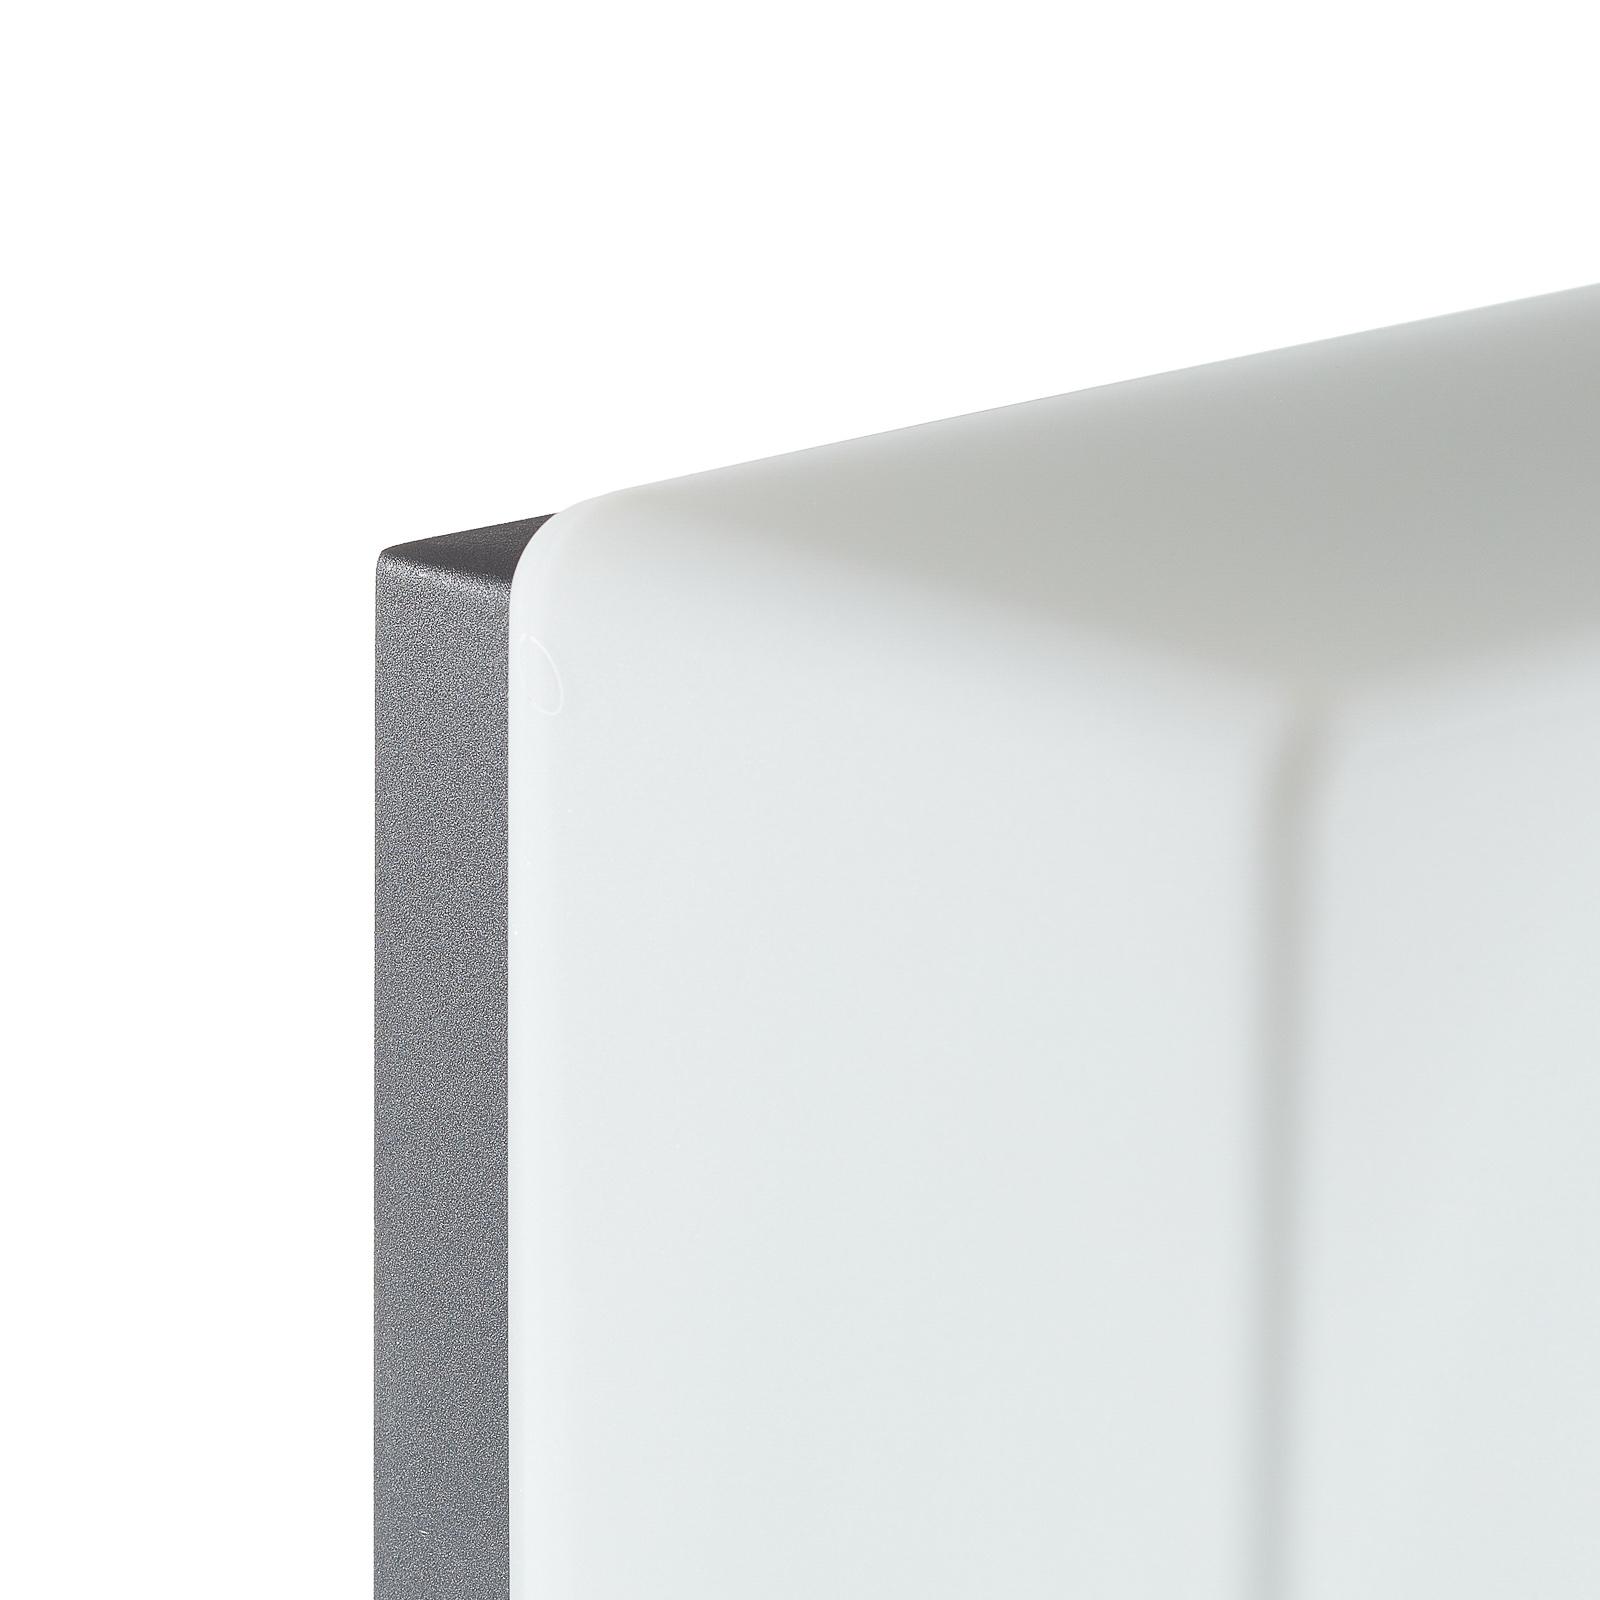 BEGA Lichtbaustein 38300 LED Wandleuchte 21x21cm